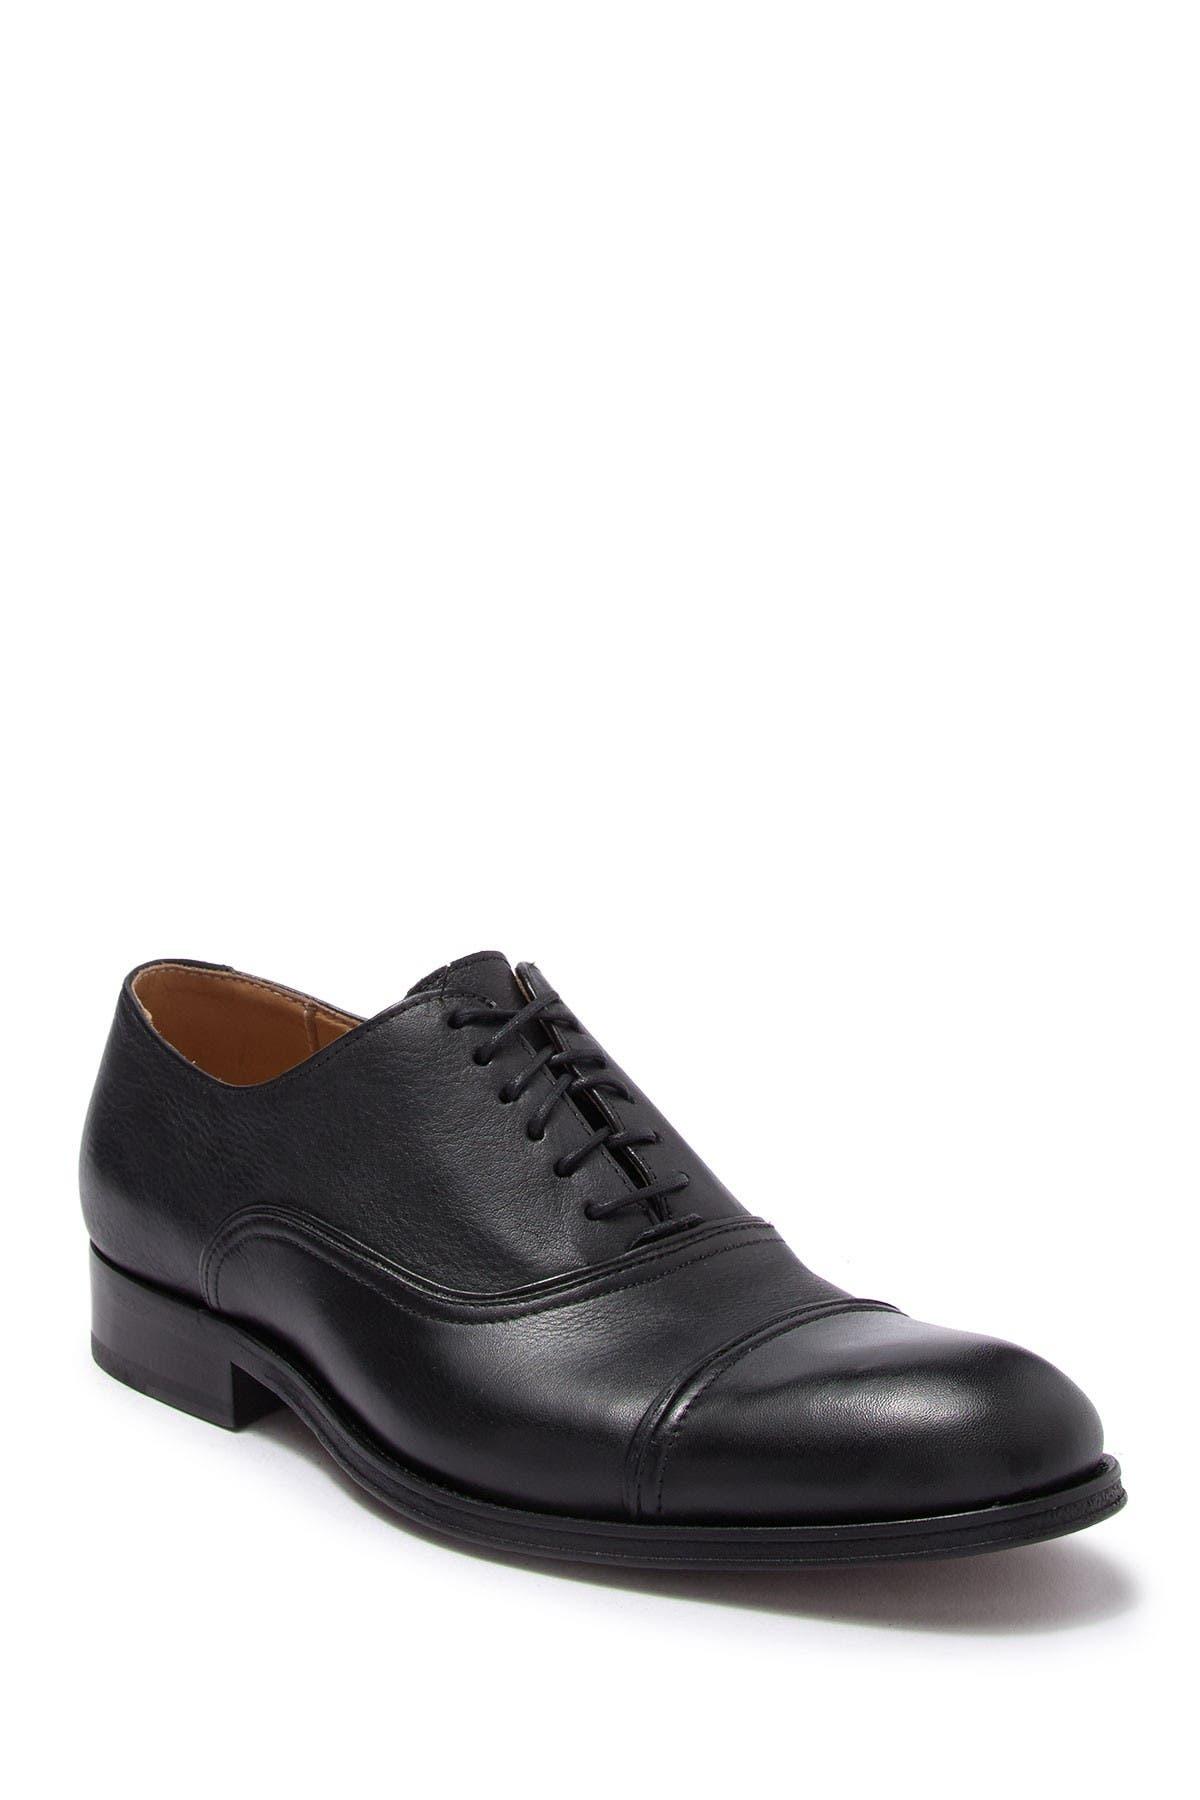 Image of Donald Pliner Garee Leather Cap Toe Oxford